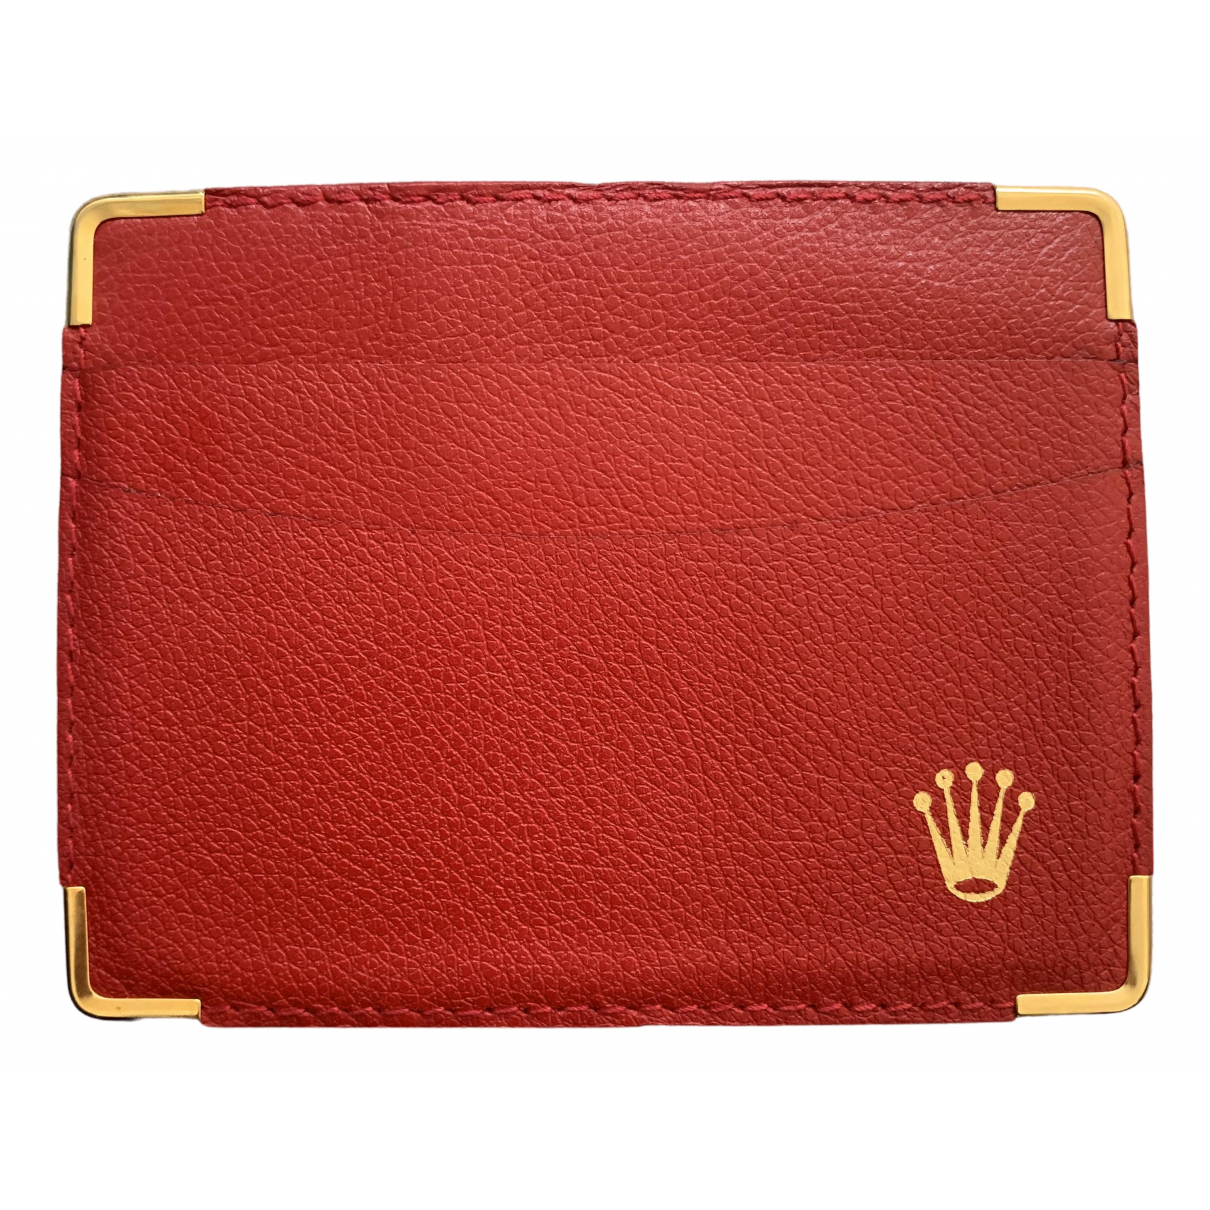 Rolex \N Kleinlederwaren in  Rot Leder